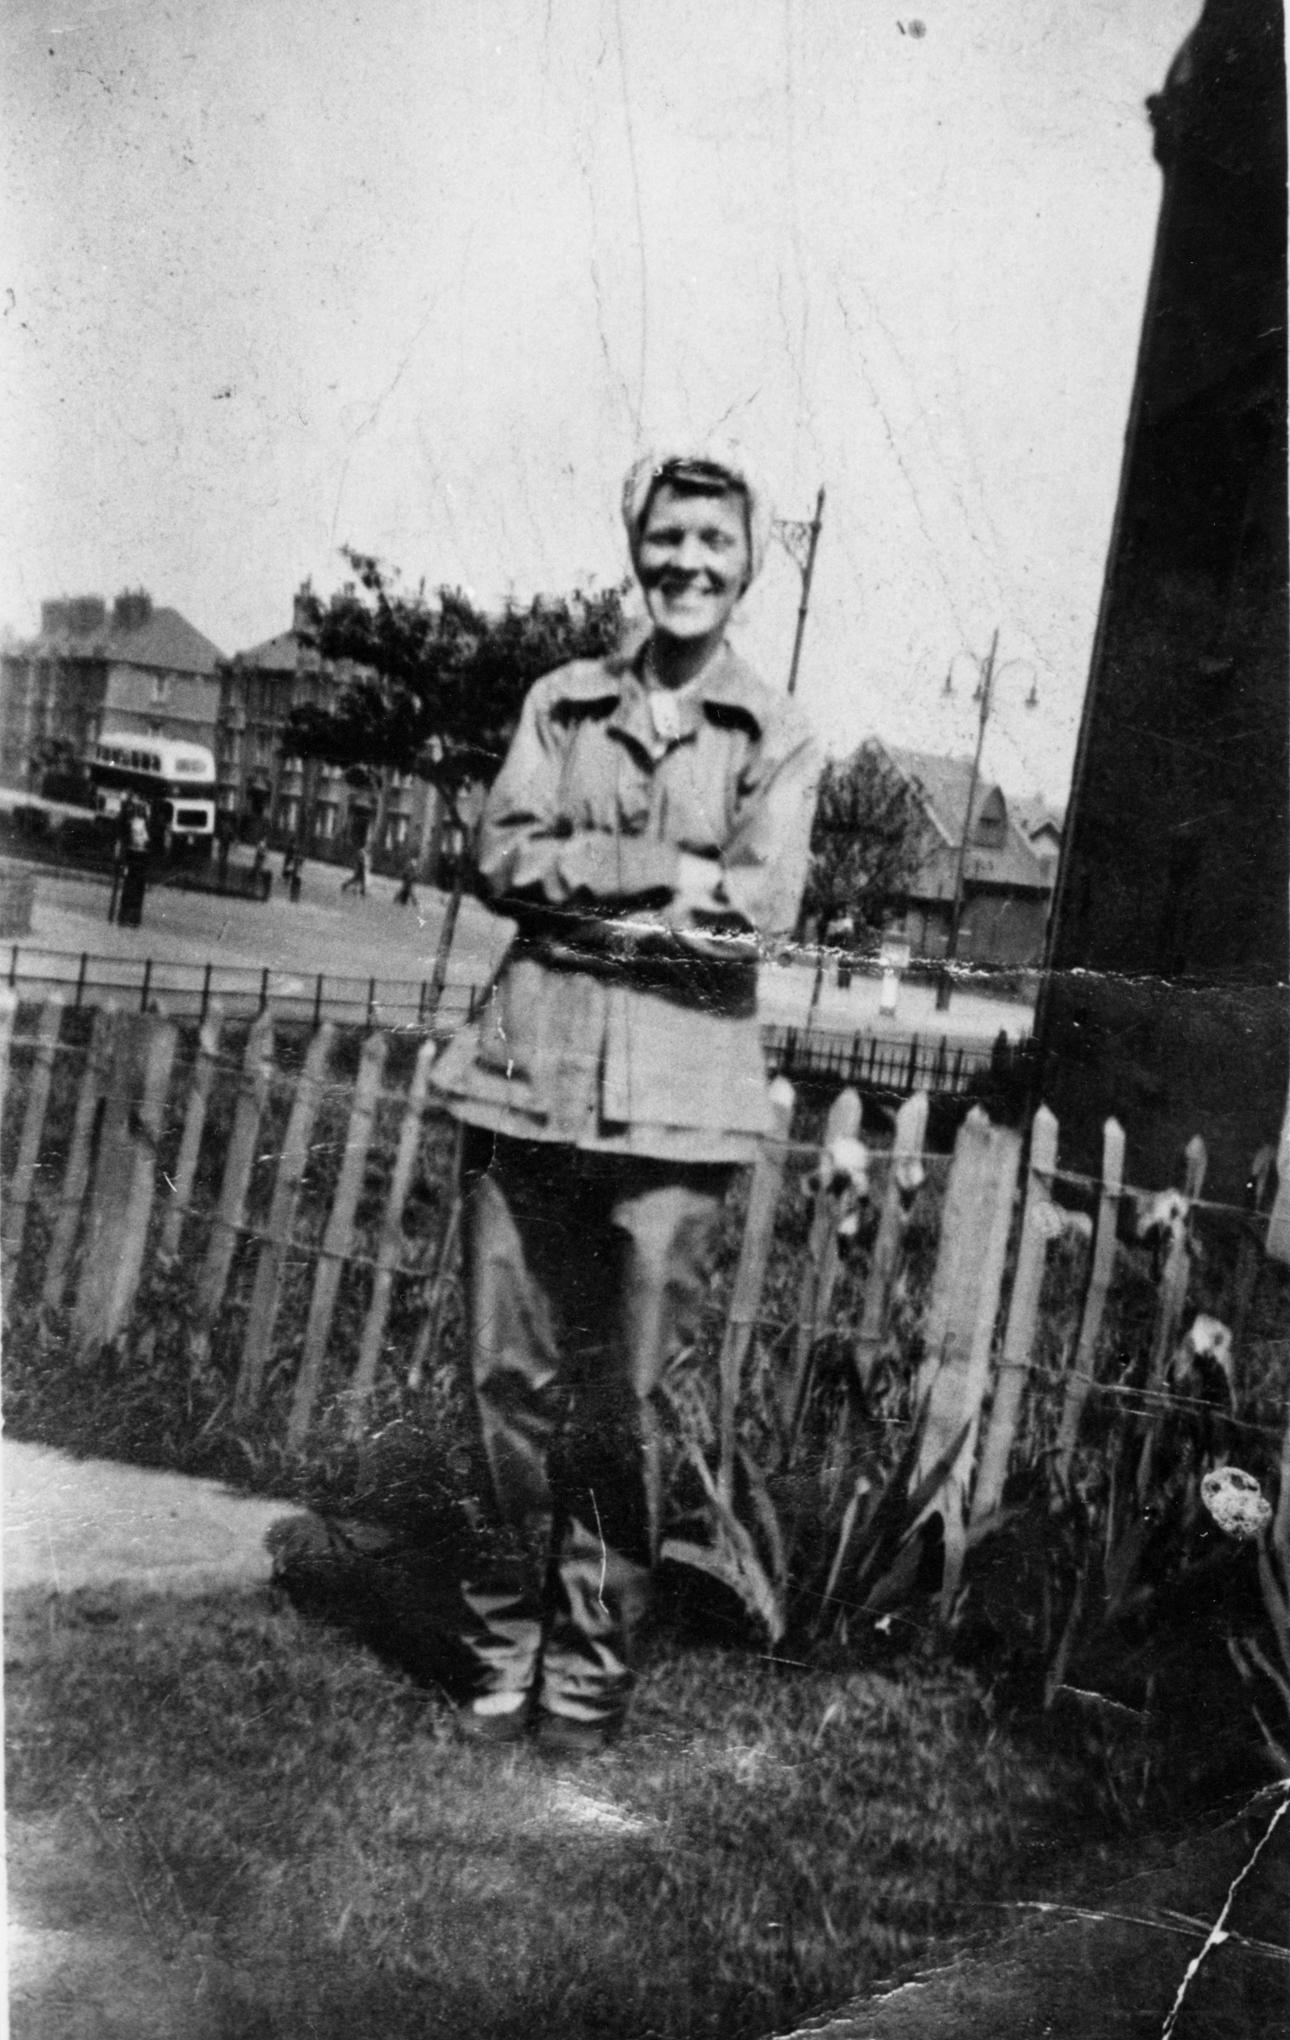 Woman In Workclothes In Garden 1940s